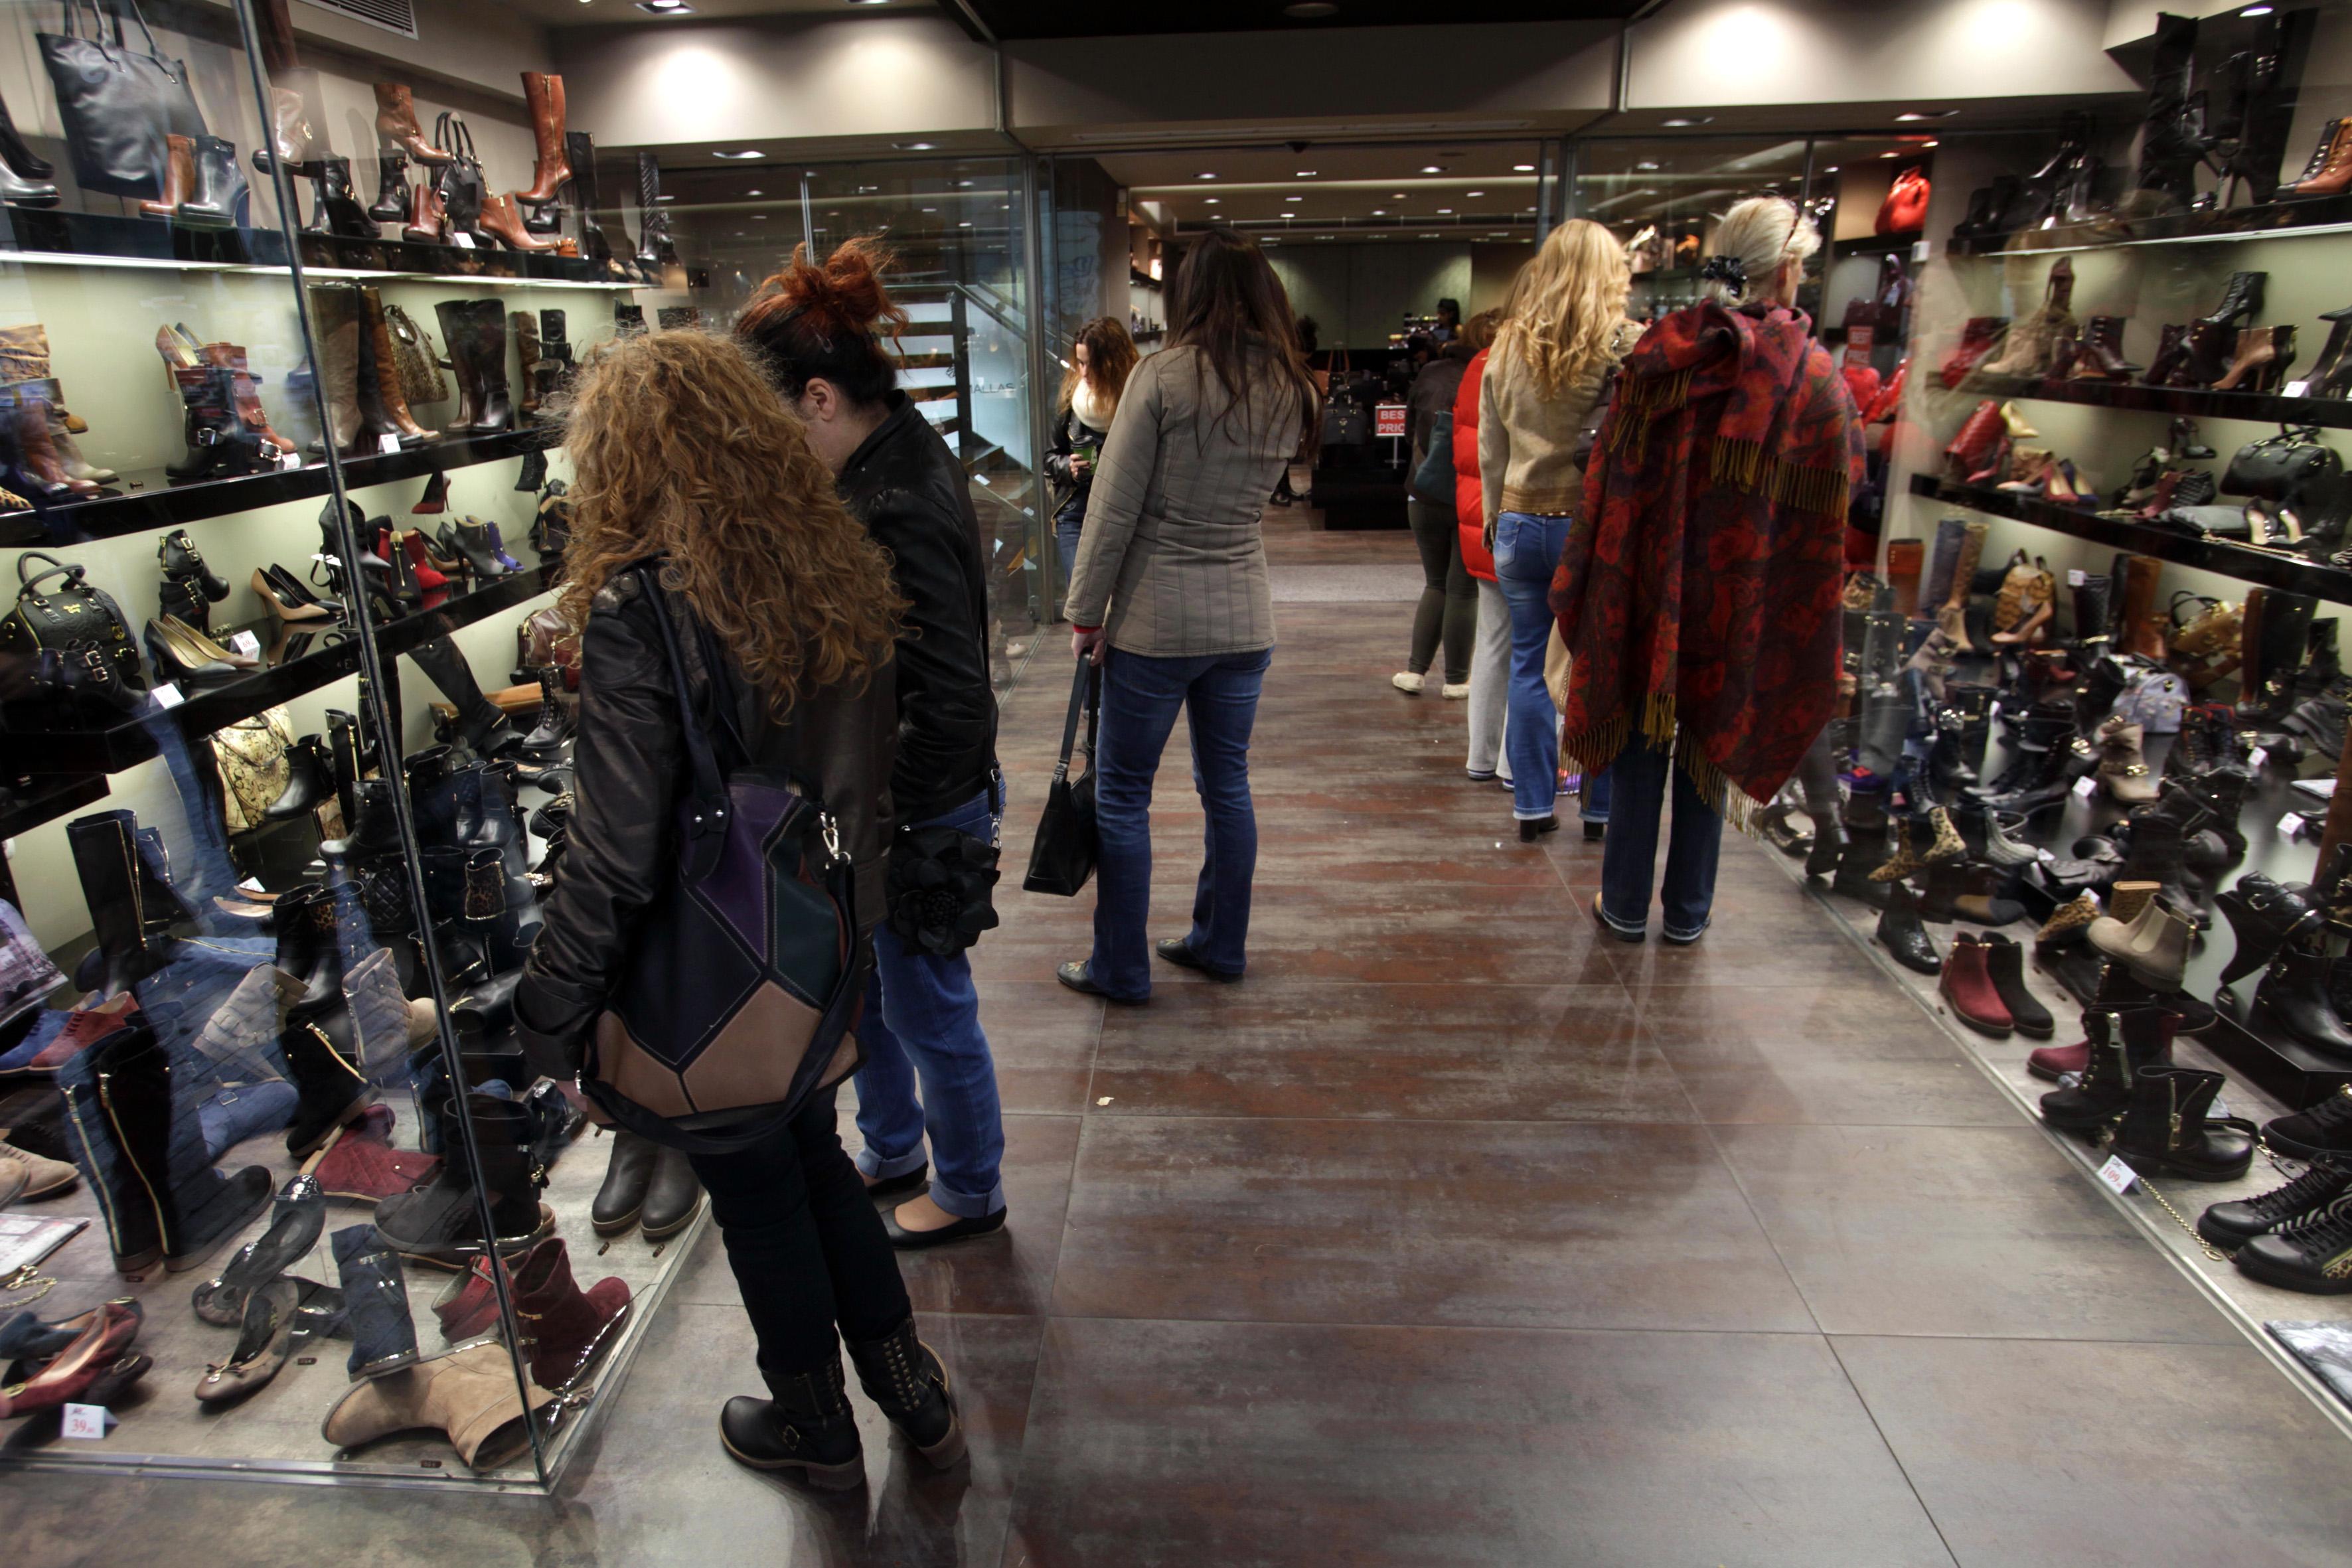 f6df4bb0b35e 382 ευρώ ξόδεψε κάθε άνθρωπος στην Ελλάδα για ρούχα και παπούτσια ...